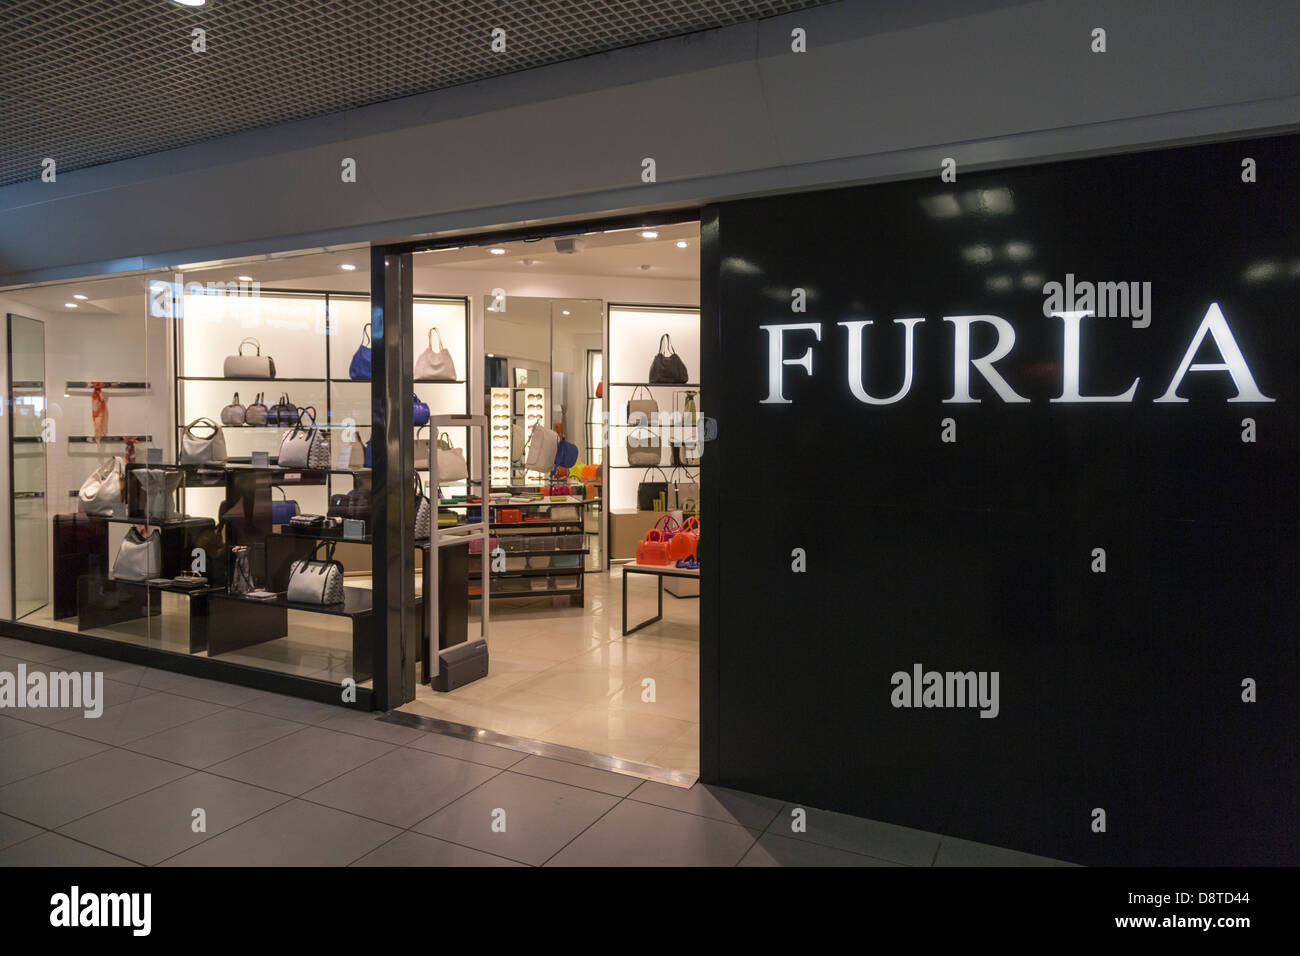 Furla shop Fiumicino Airport, Rome, Italy - Stock Image